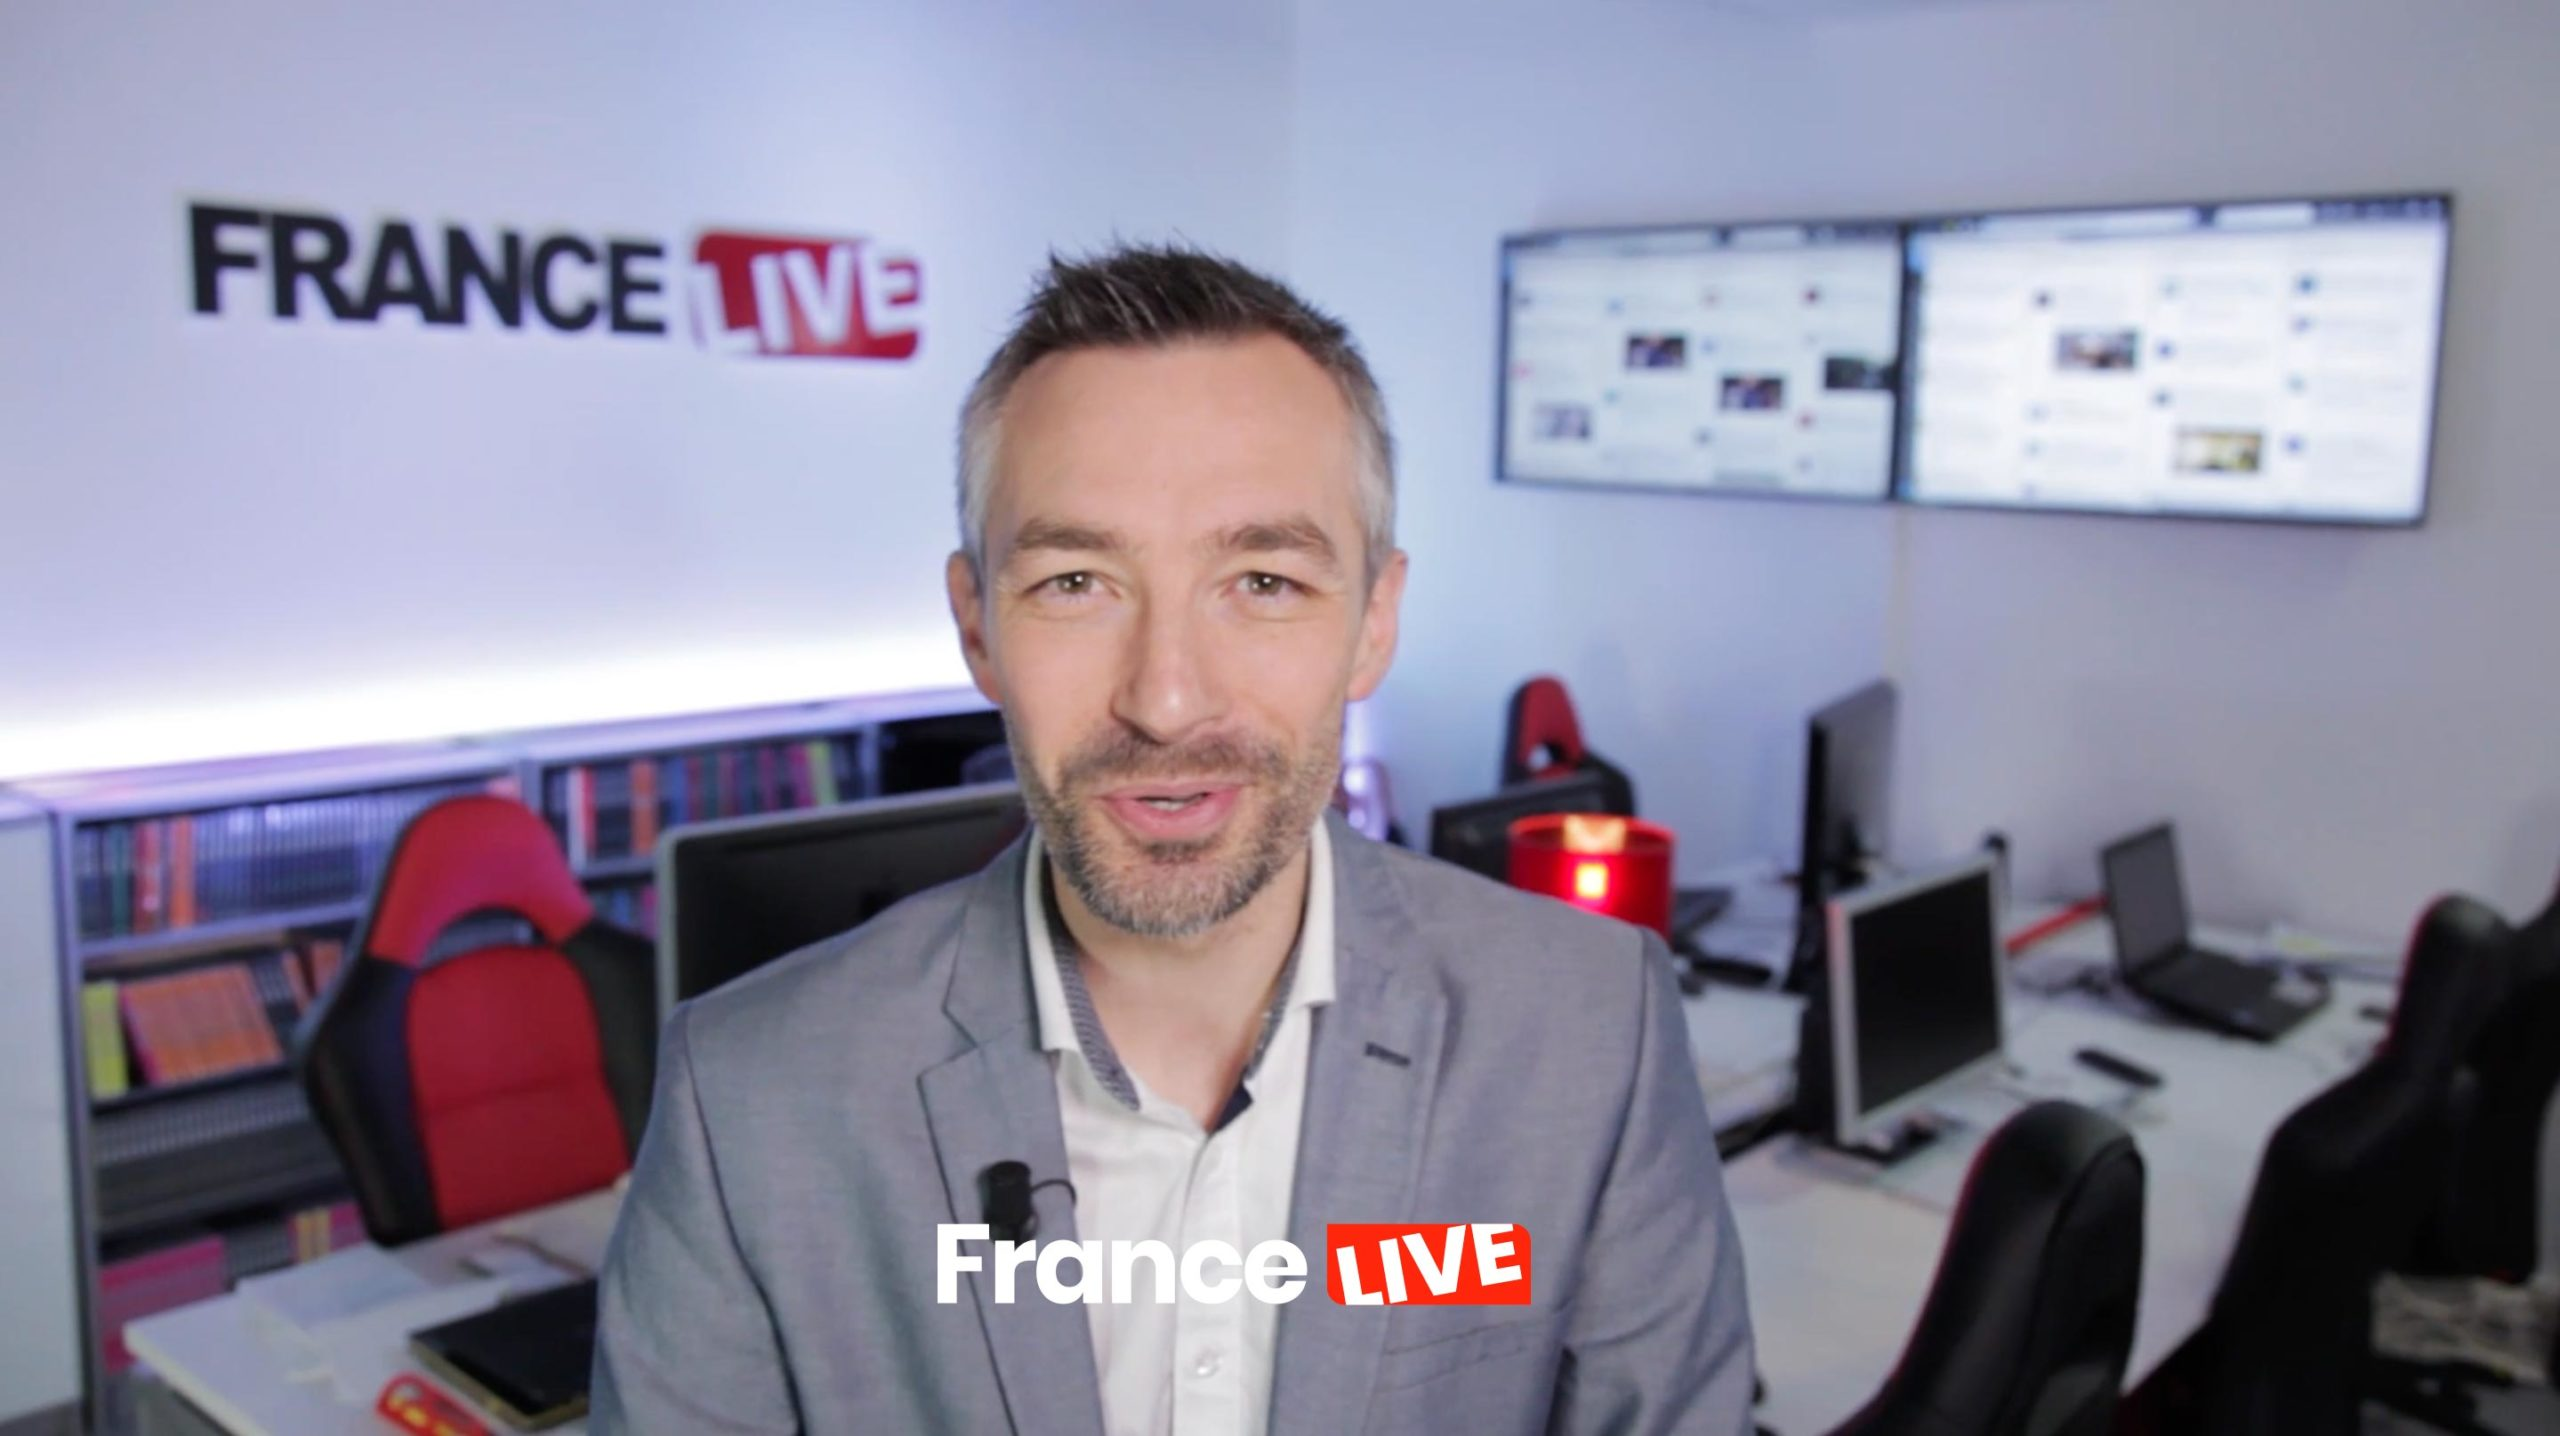 FRANCE LIVE CLUB